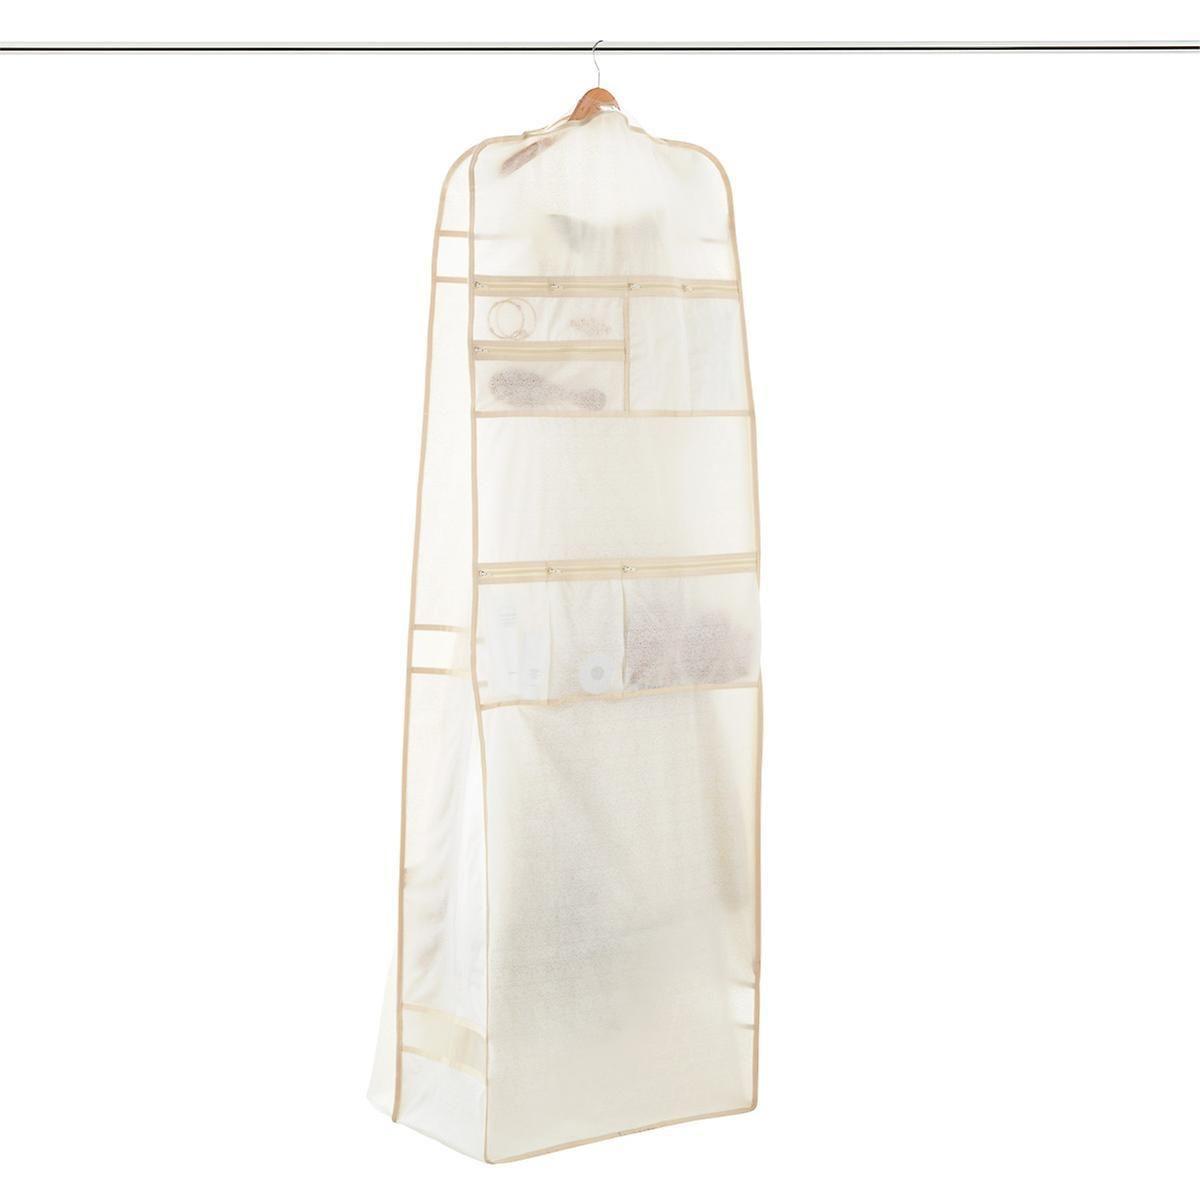 Setready Wedding Dress Garment Bag Dress Garment Bags Wedding Dress Garment Bags Garment Bag